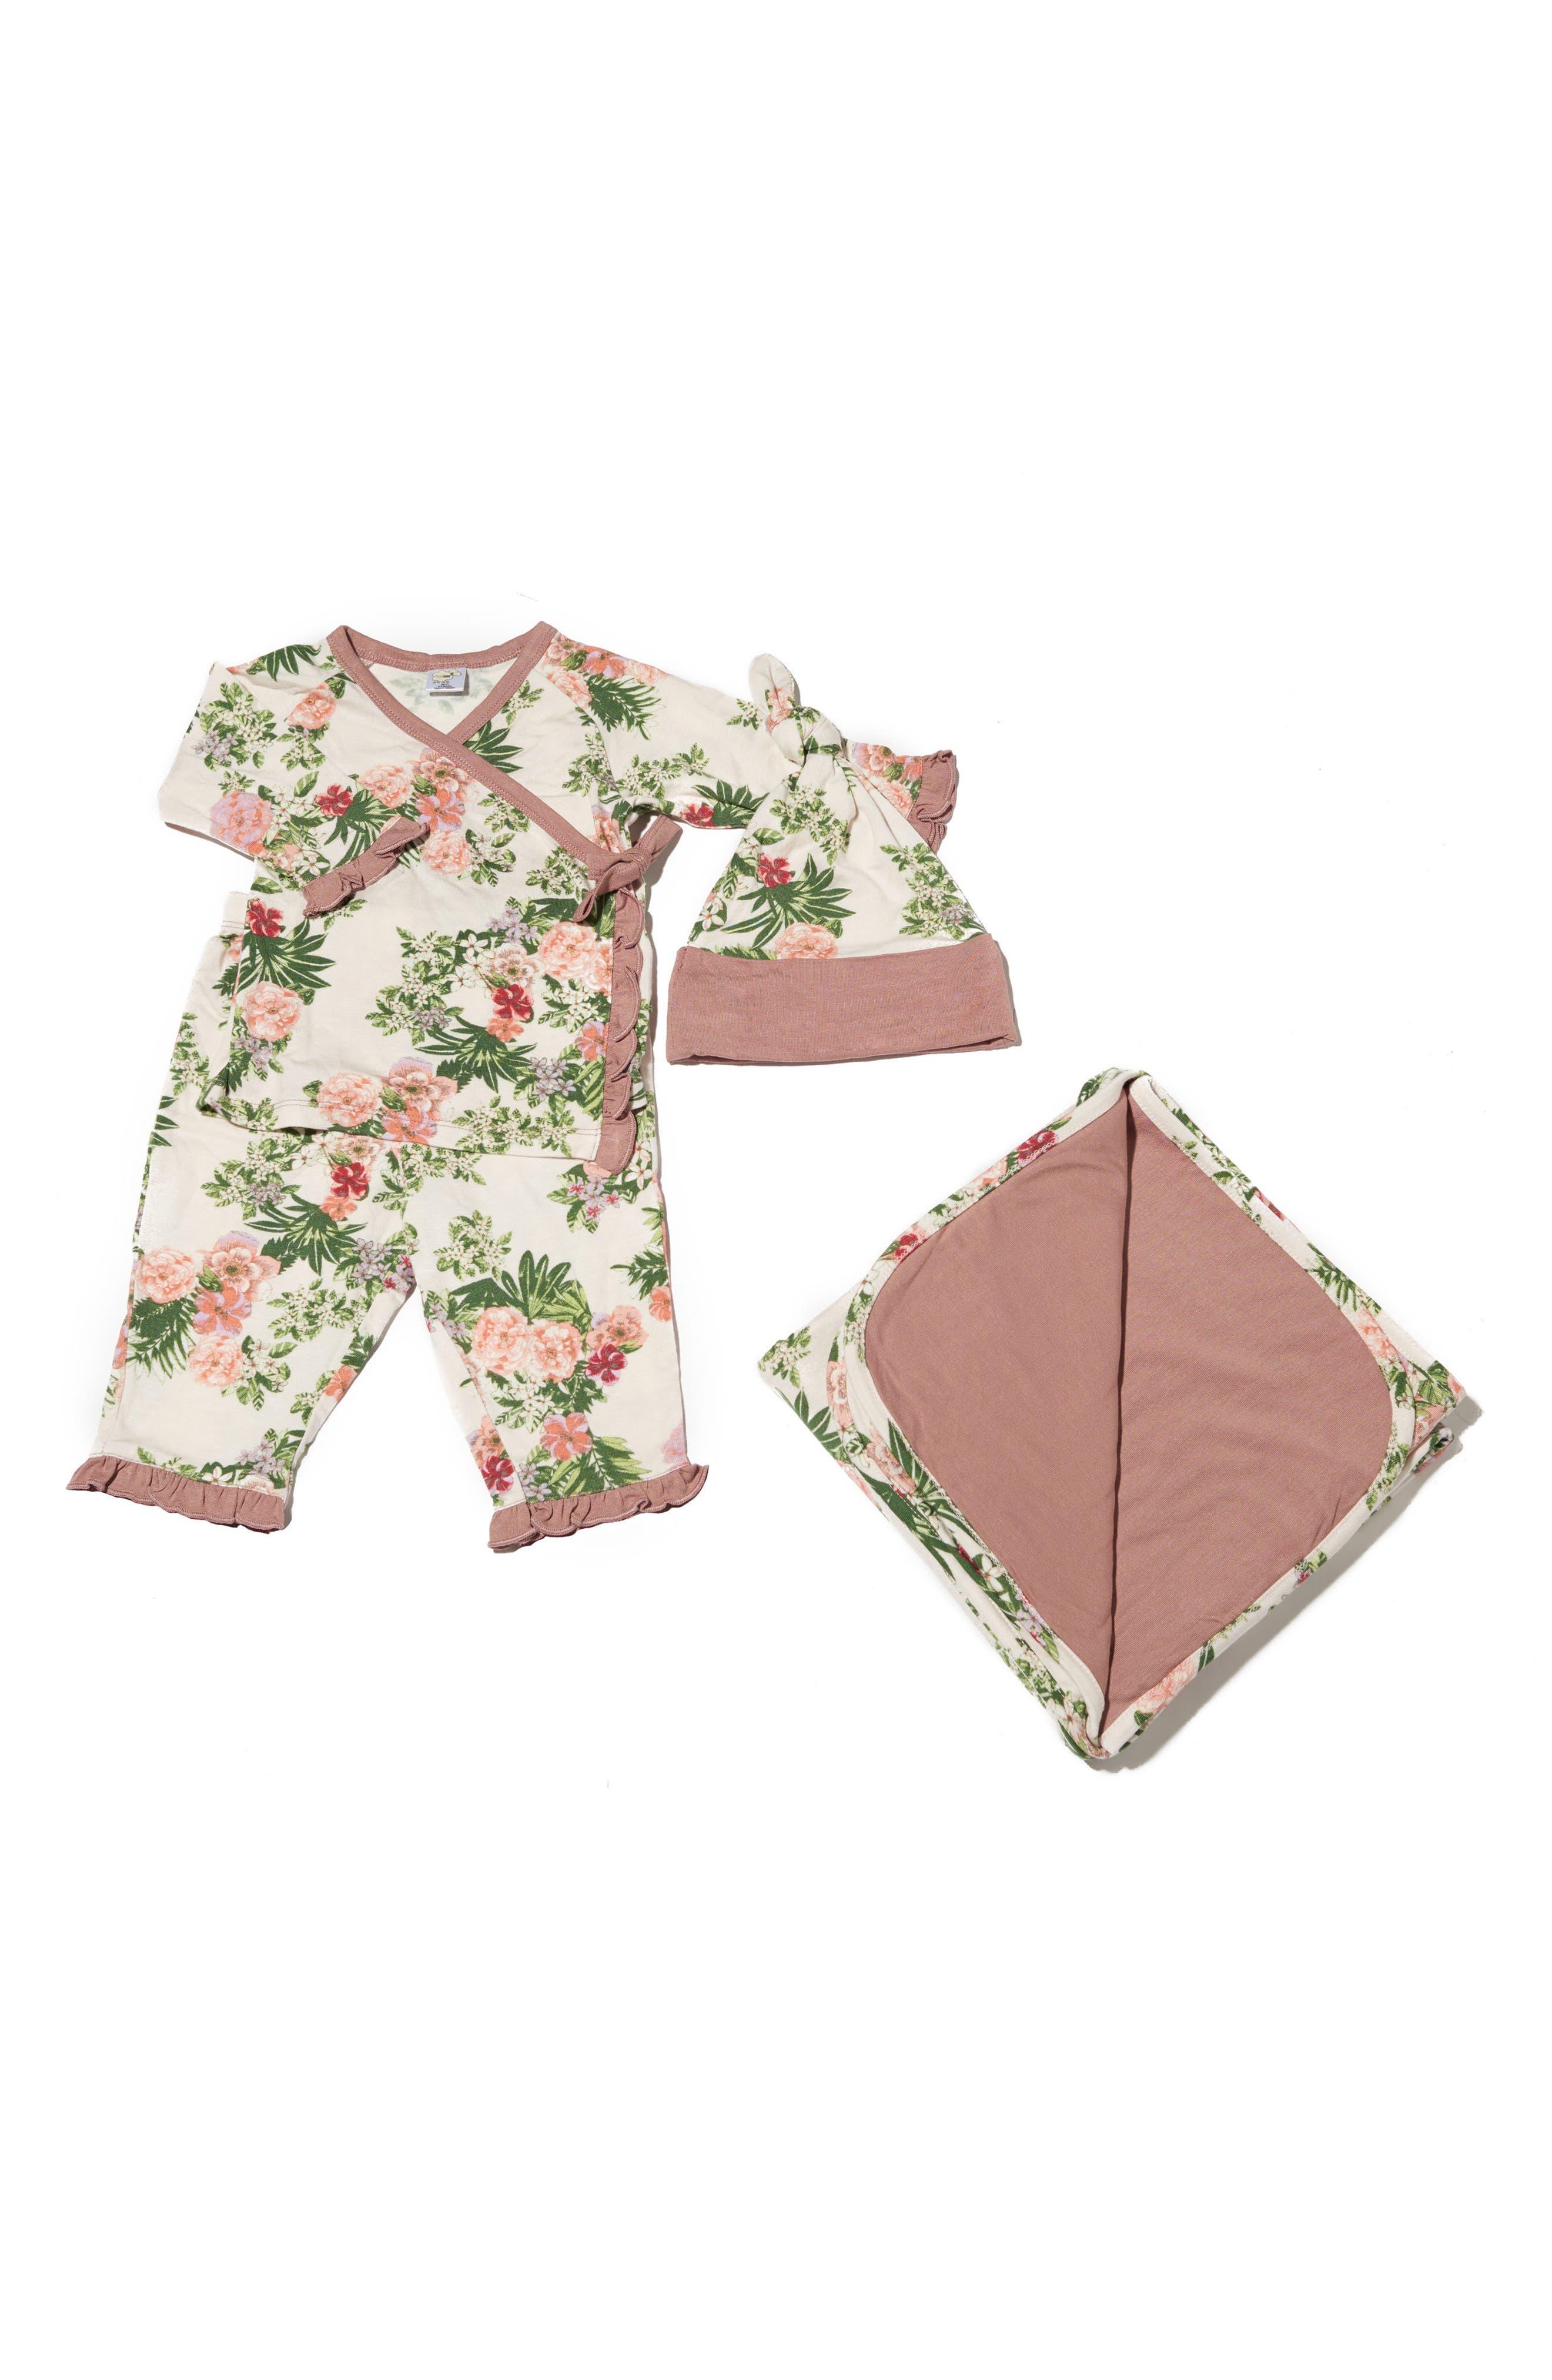 Ruffle Kimono Top, Pants, Hat & Blanket Set,                         Main,                         color, BEIGE FLORAL